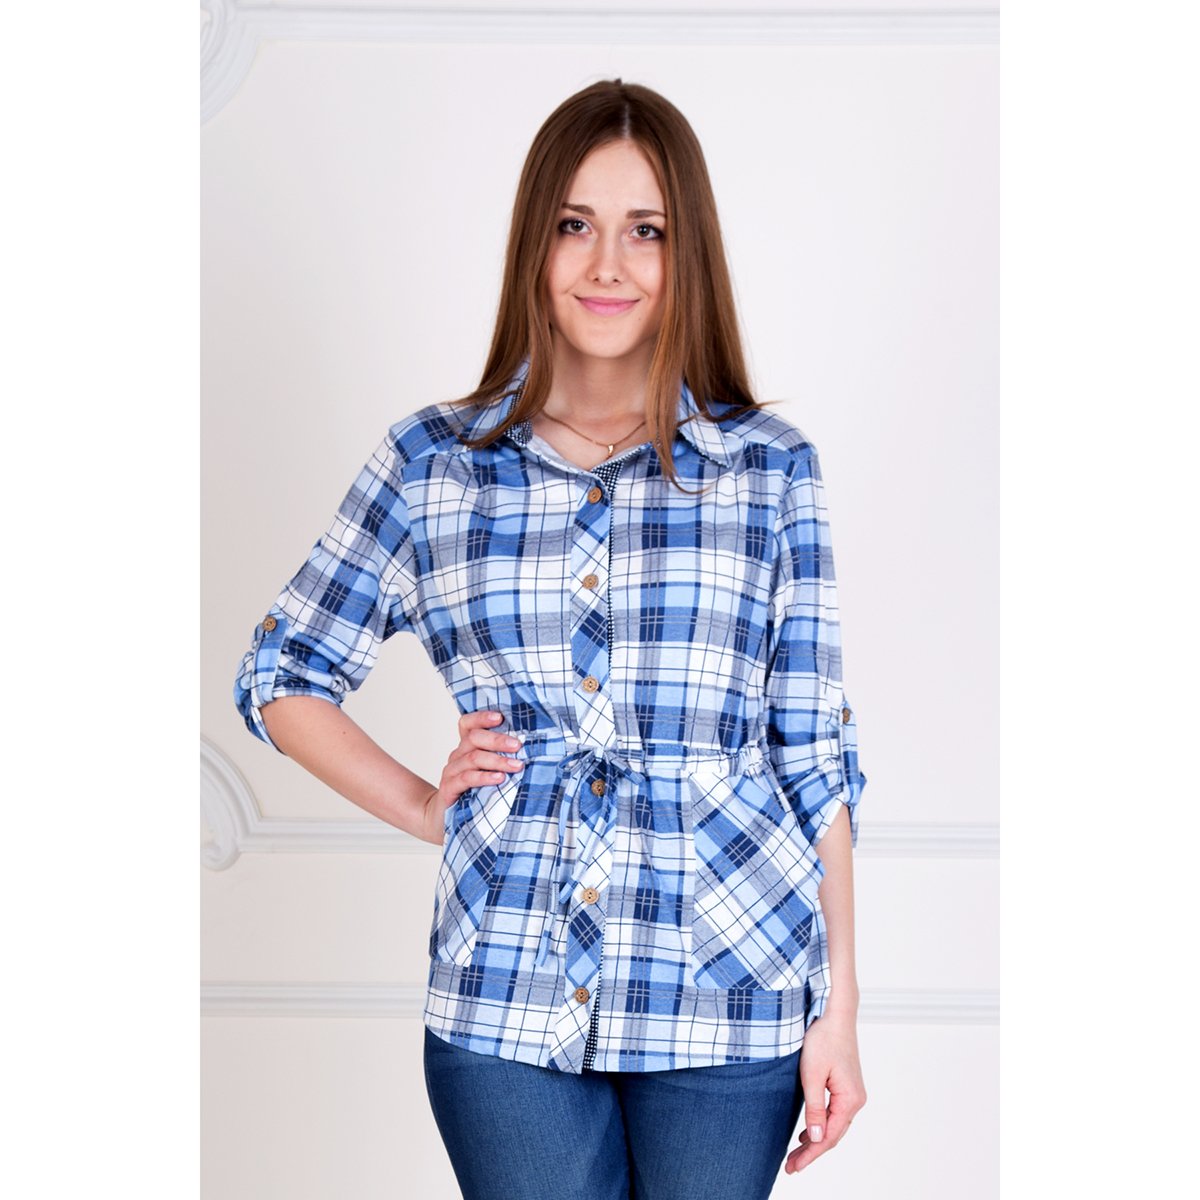 Женская рубашка Клетка Голубой, размер 62Блузки, майки, кофты<br>Обхват груди:124 см<br>Обхват талии:105 см<br>Обхват бедер:132 см<br>Рост:167 см<br><br>Тип: Жен. рубашка<br>Размер: 62<br>Материал: Кулирка